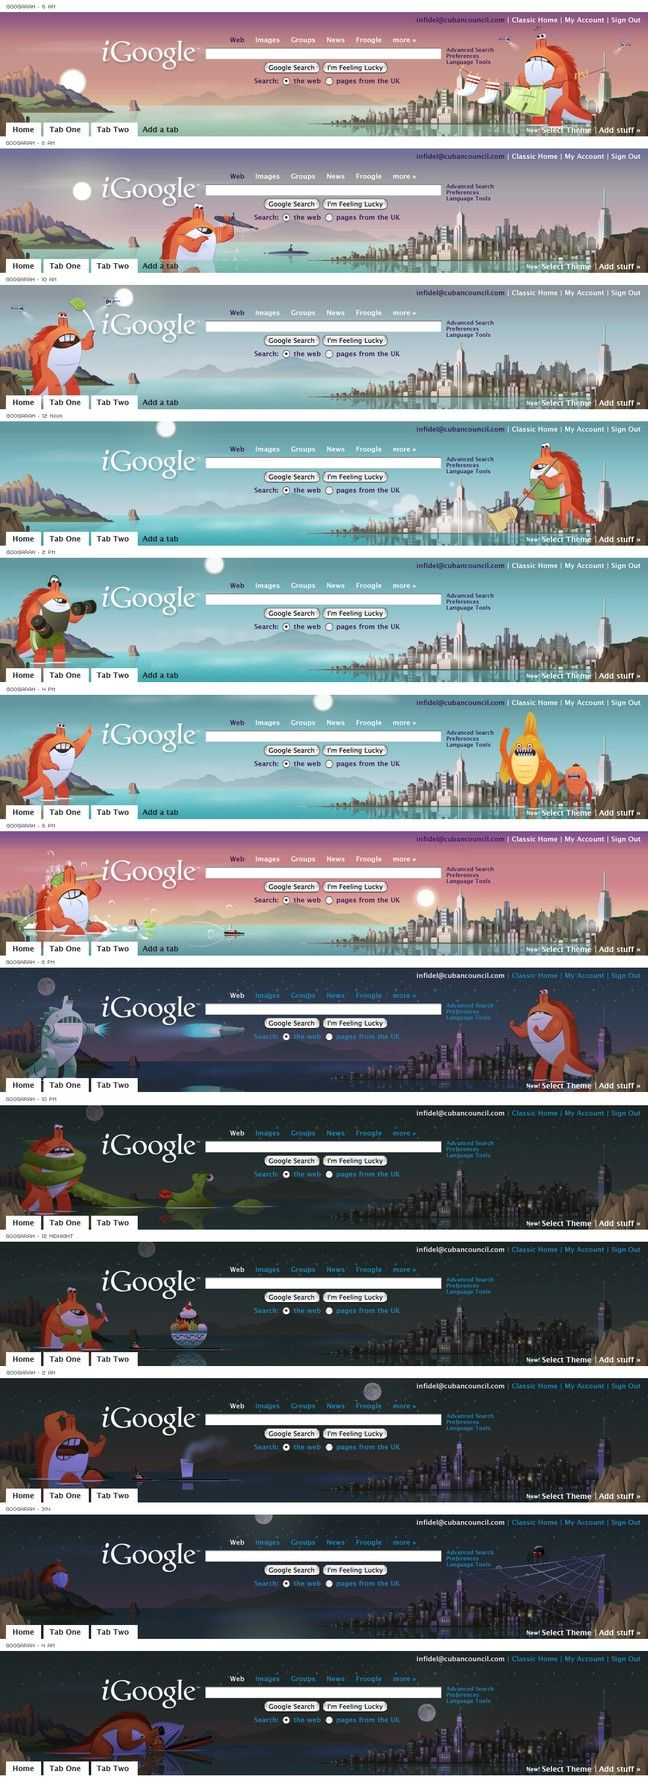 Google themes that move -  Google Y U No Move Dynamic Themes To Google Chrome Igoogle Themes Lolz Absurdities Nerdities And Oddities Pinterest Google Chrome